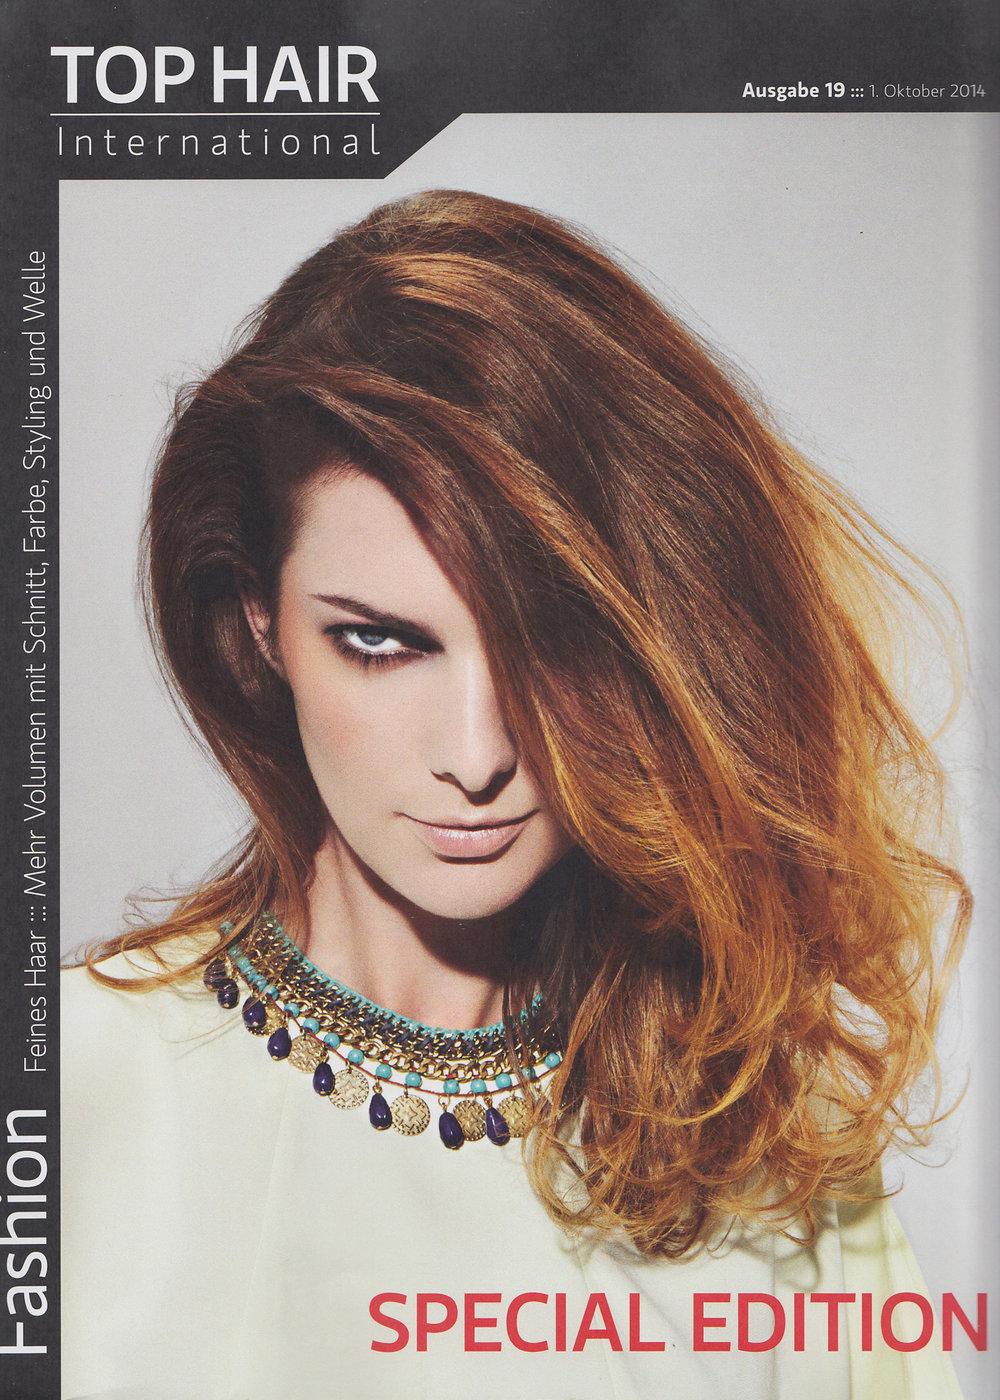 yoshikohair_stkilda_melbourne_hairdresser_hairsalon_tophair_cover